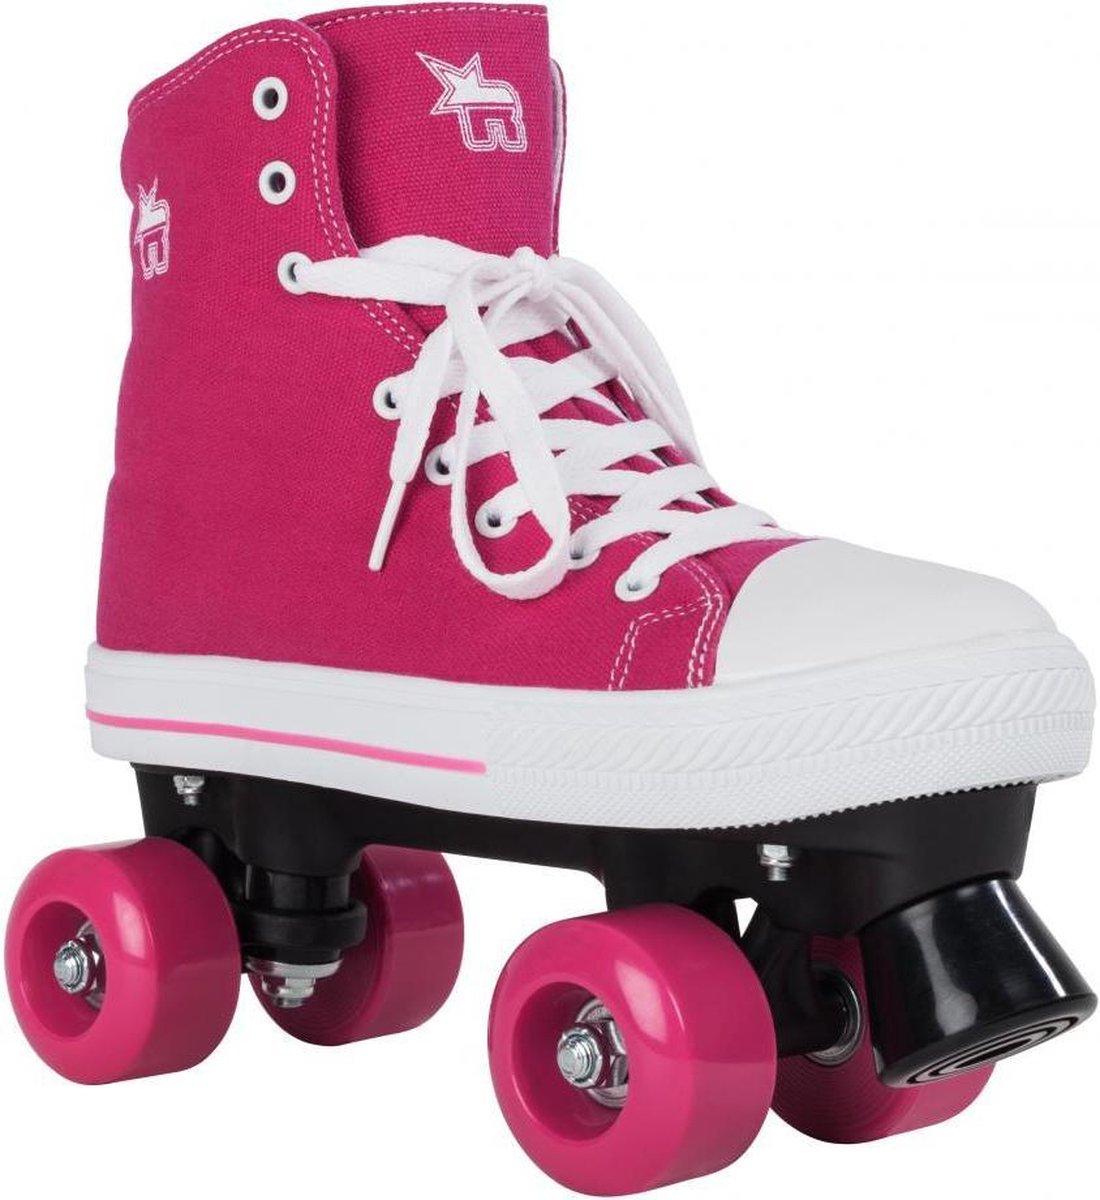 Rookie Canvas high roze rolschaatsen